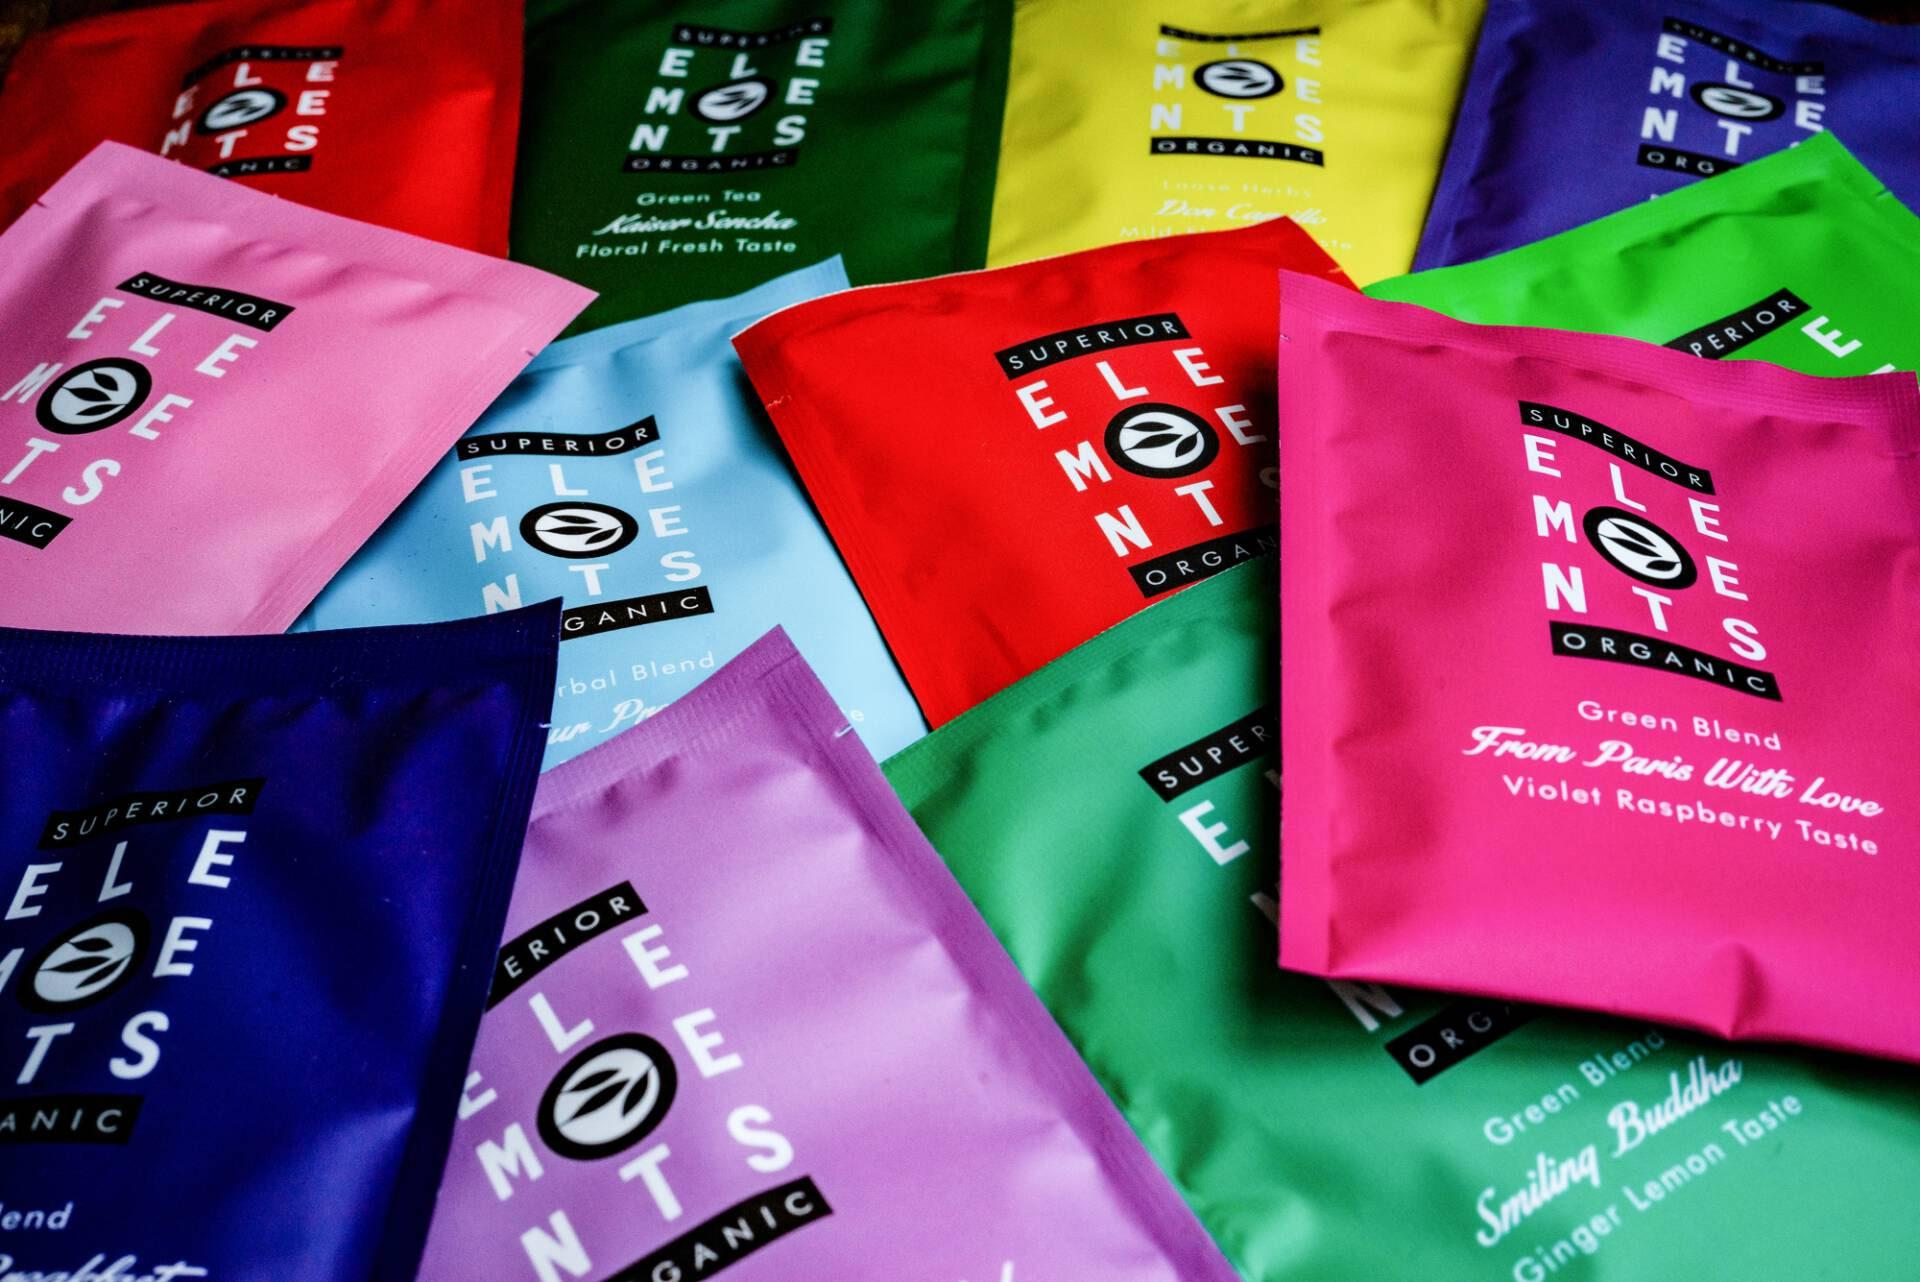 Branding Photography for alveus Premium Teas*